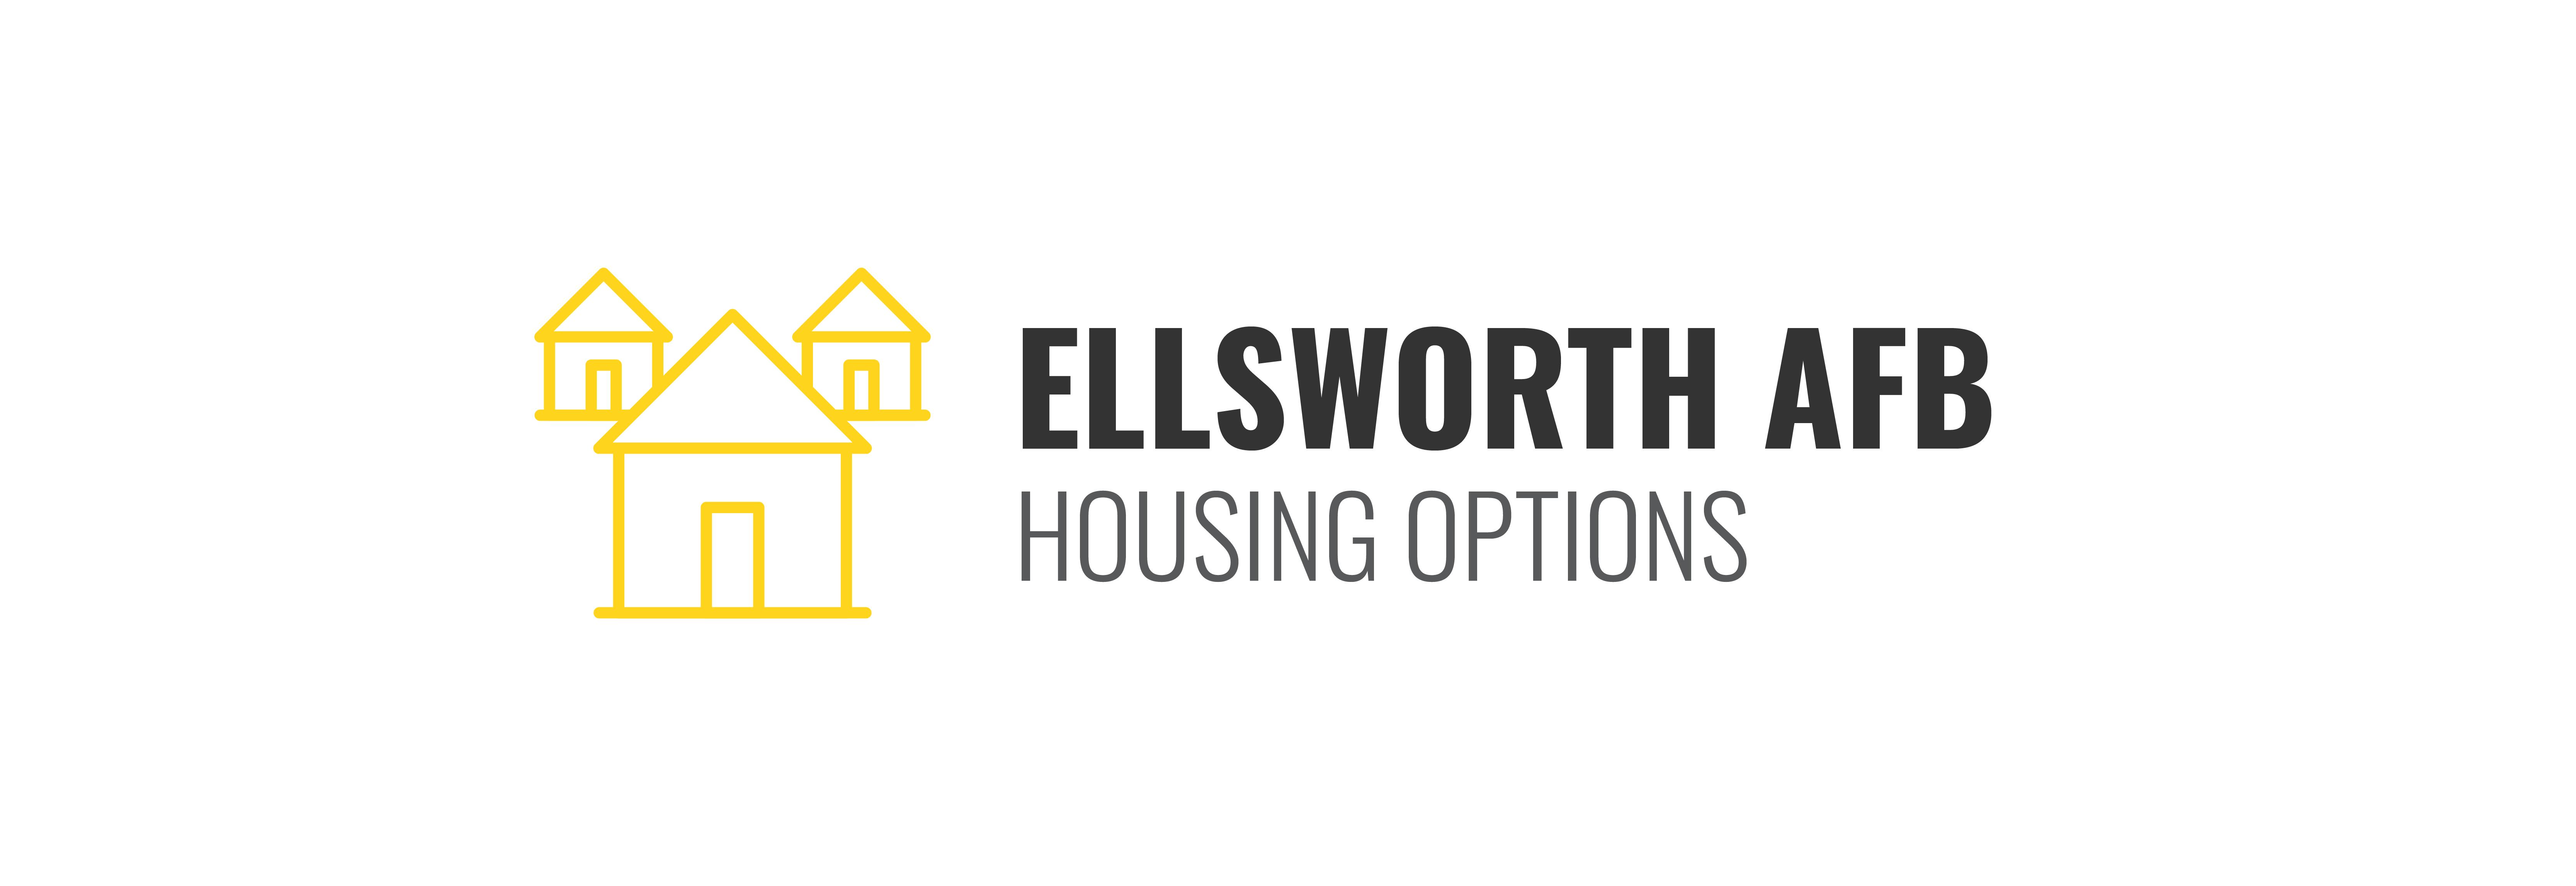 Ellsworth AFB Housing Options